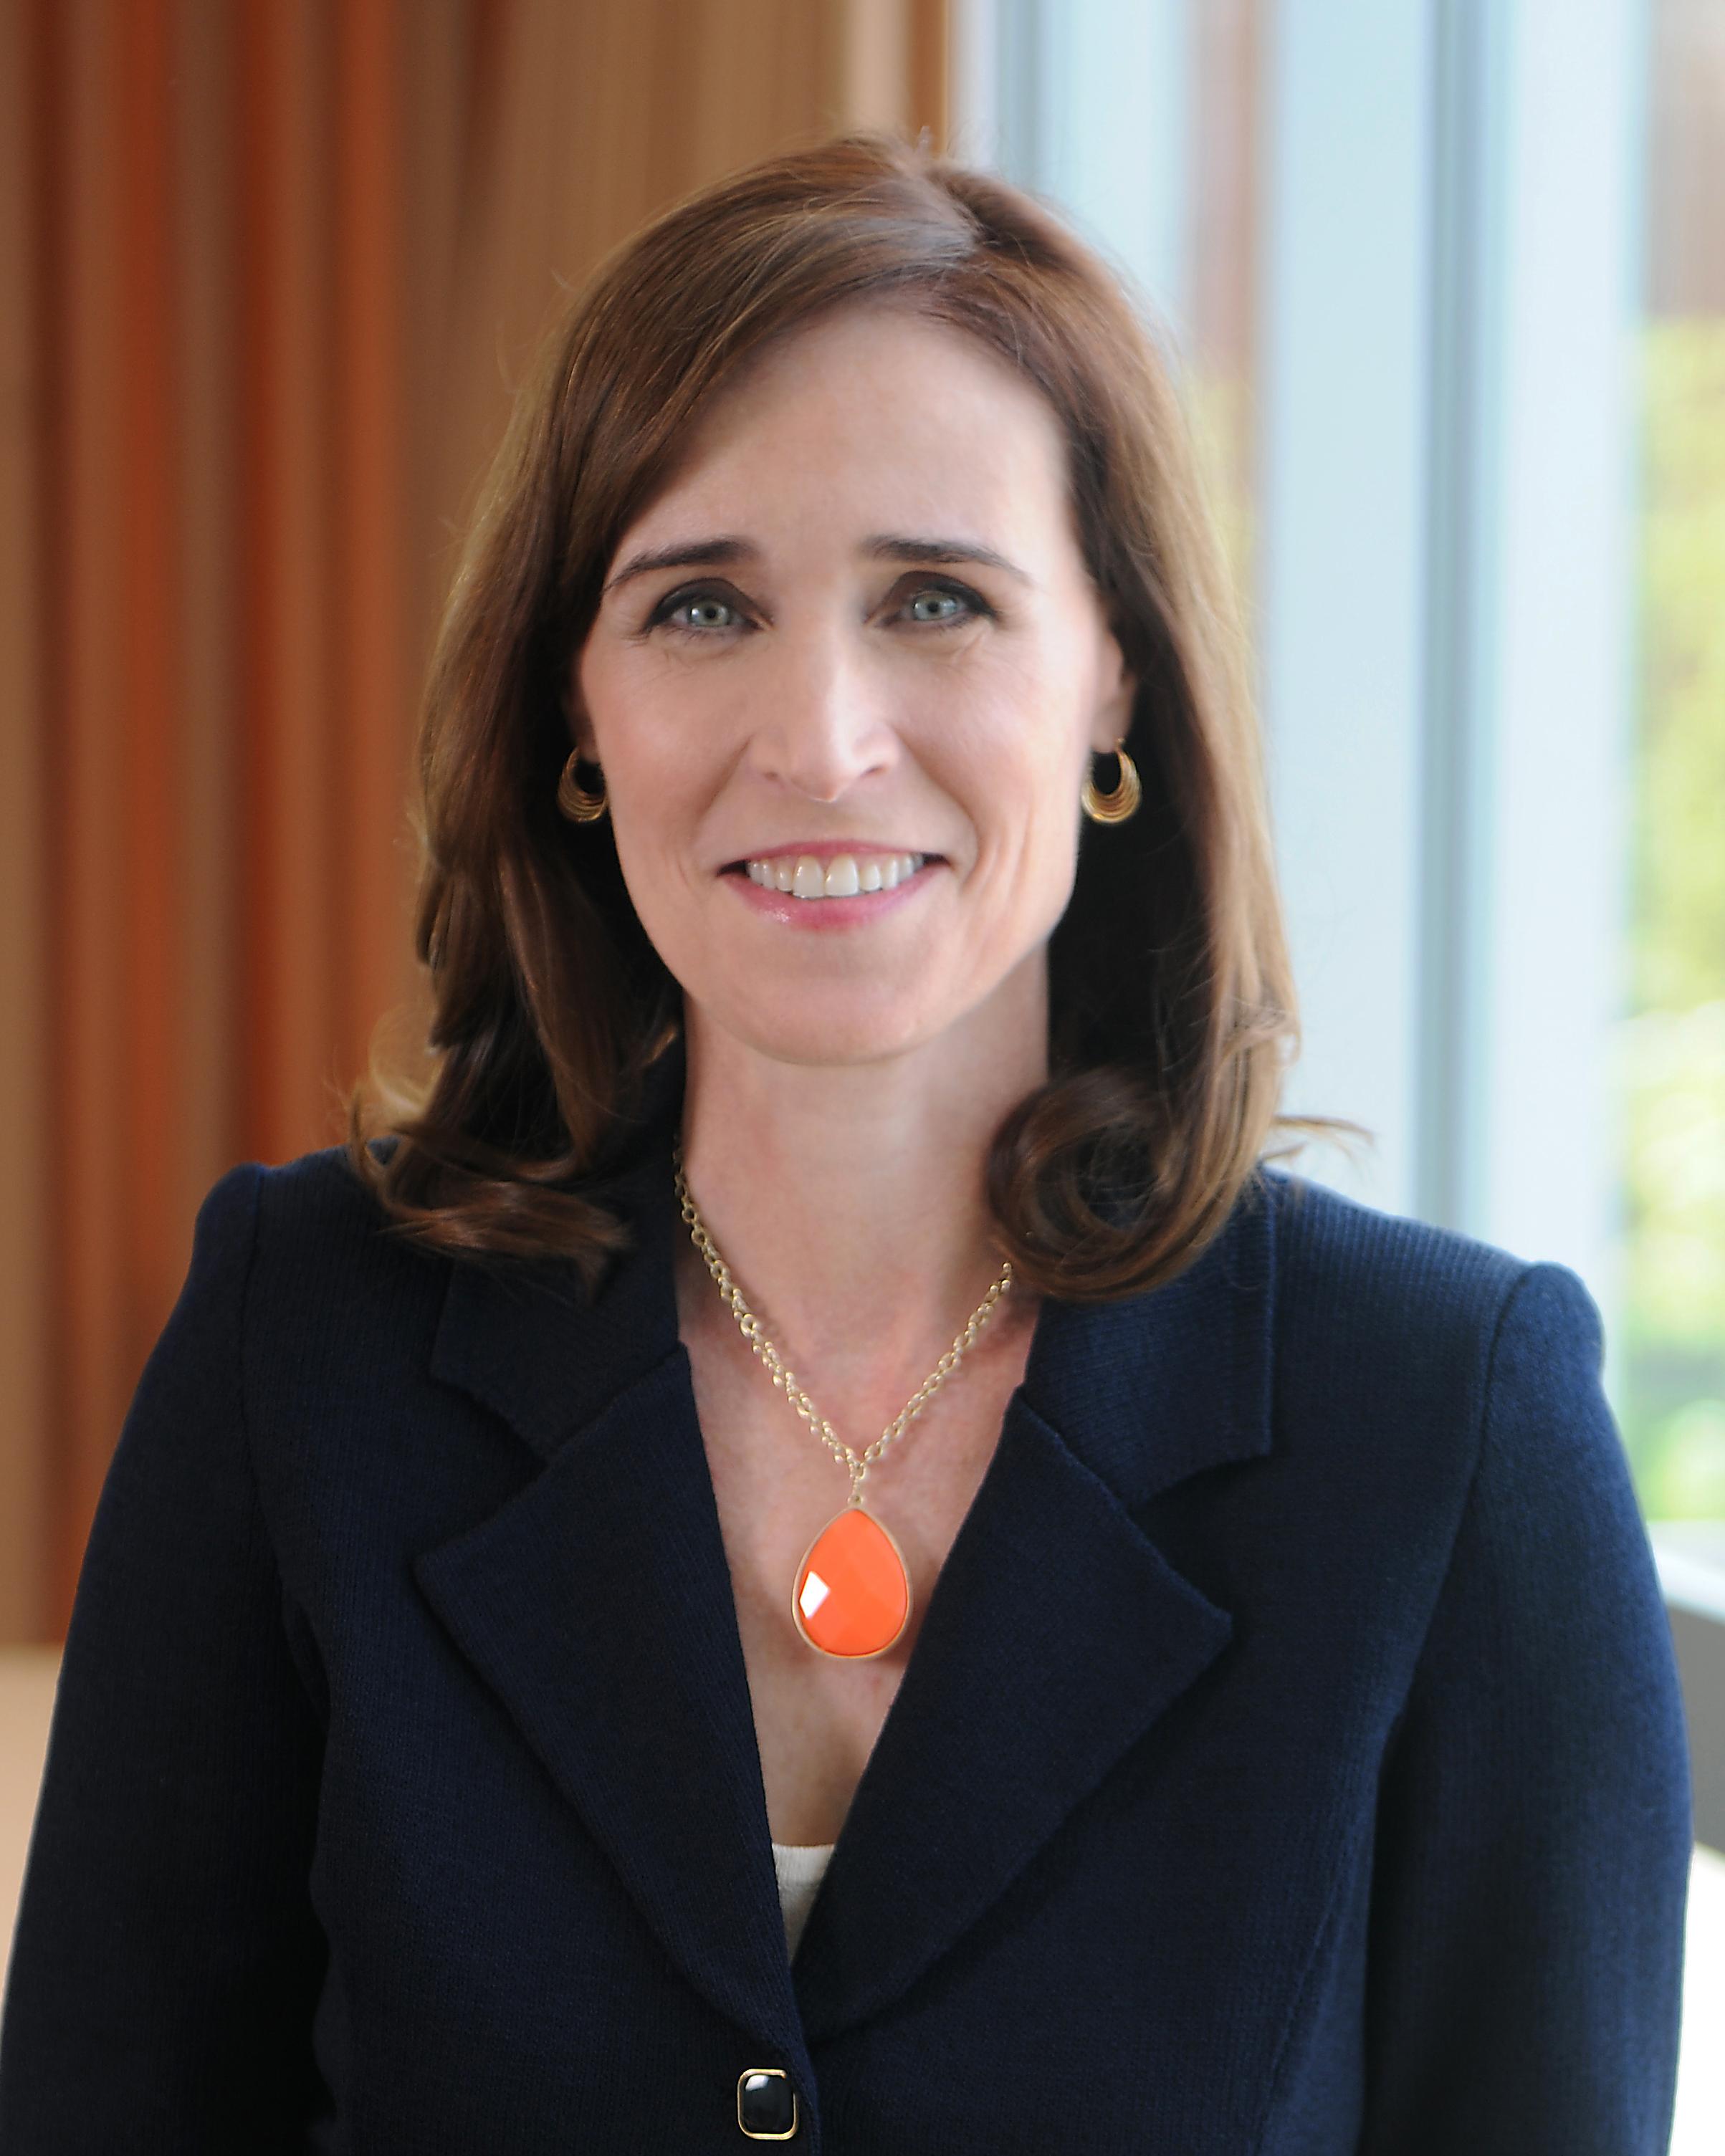 President Christine M. Riordan, Ph.D.